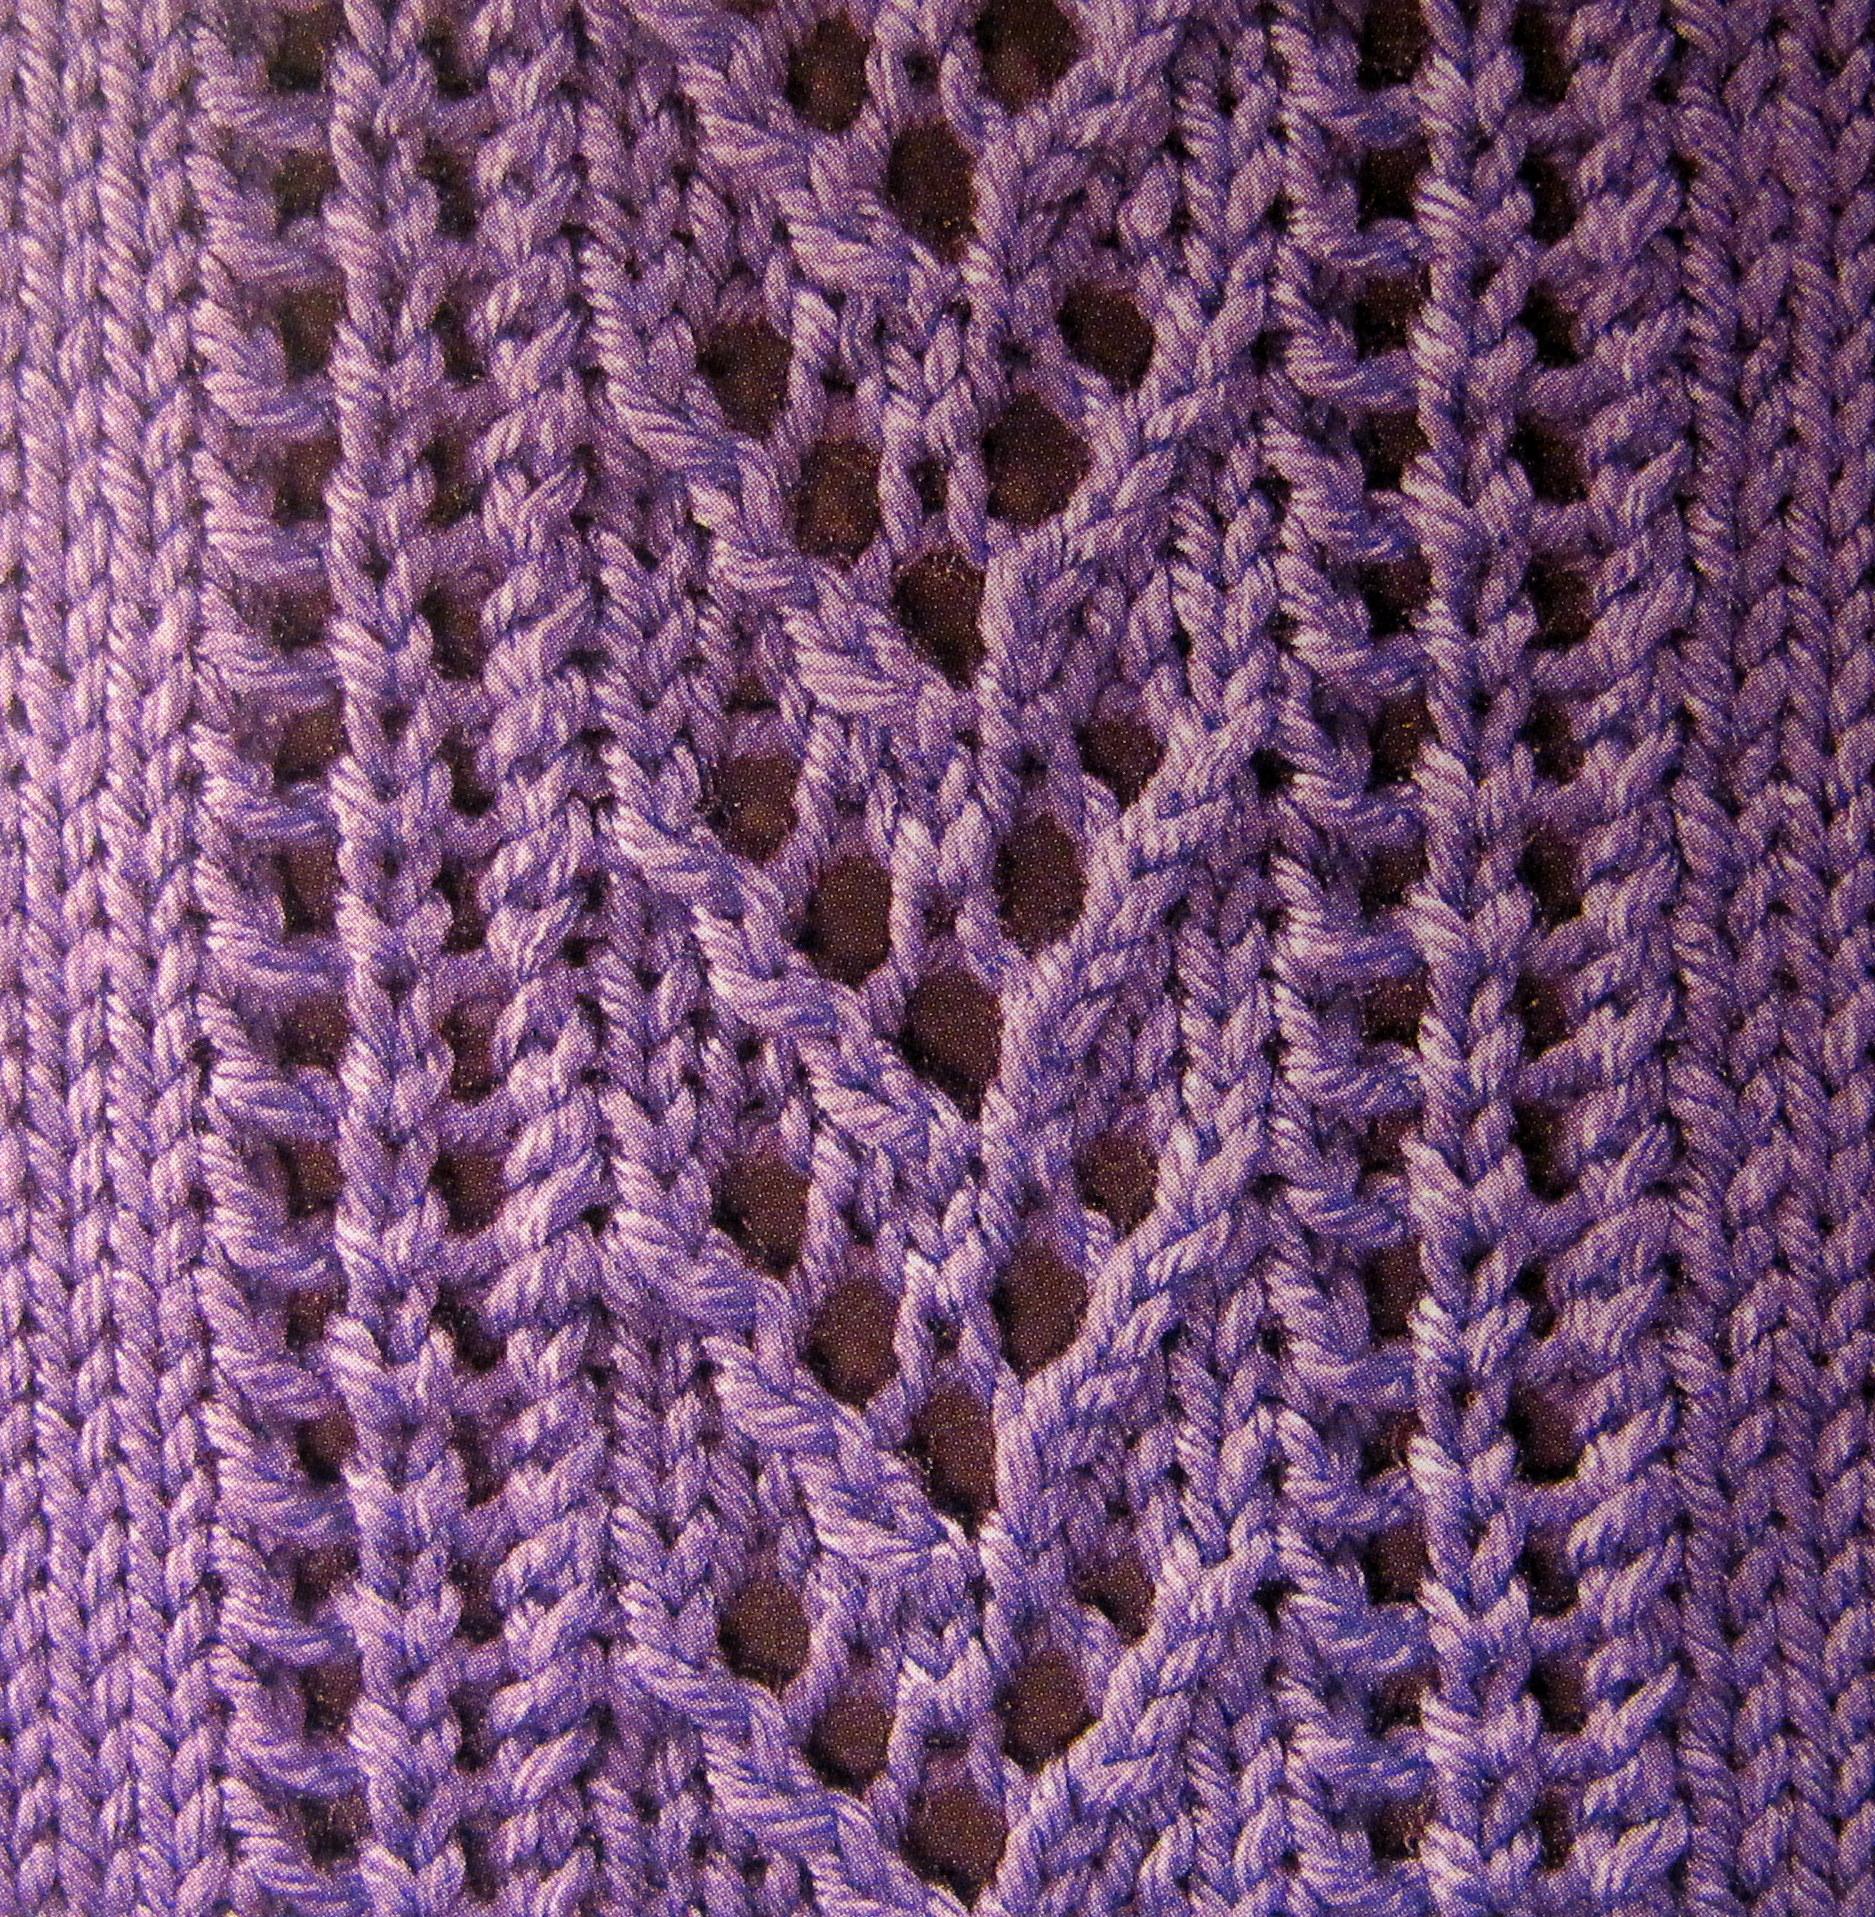 Vandyke Lace Knitting Pattern : knitting Cobwebs and Cubbyholes Page 5